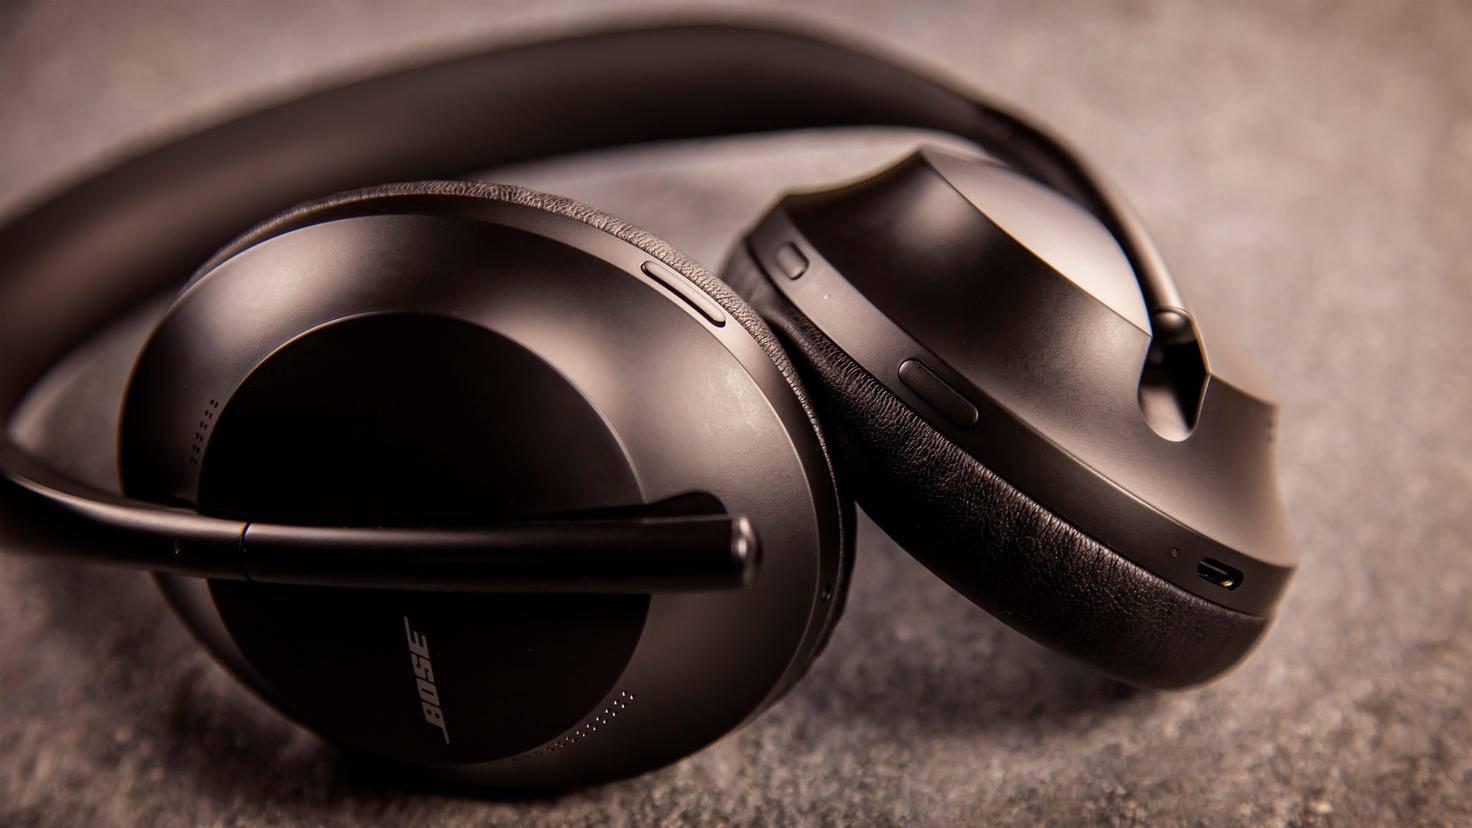 bose-headphones-700-6